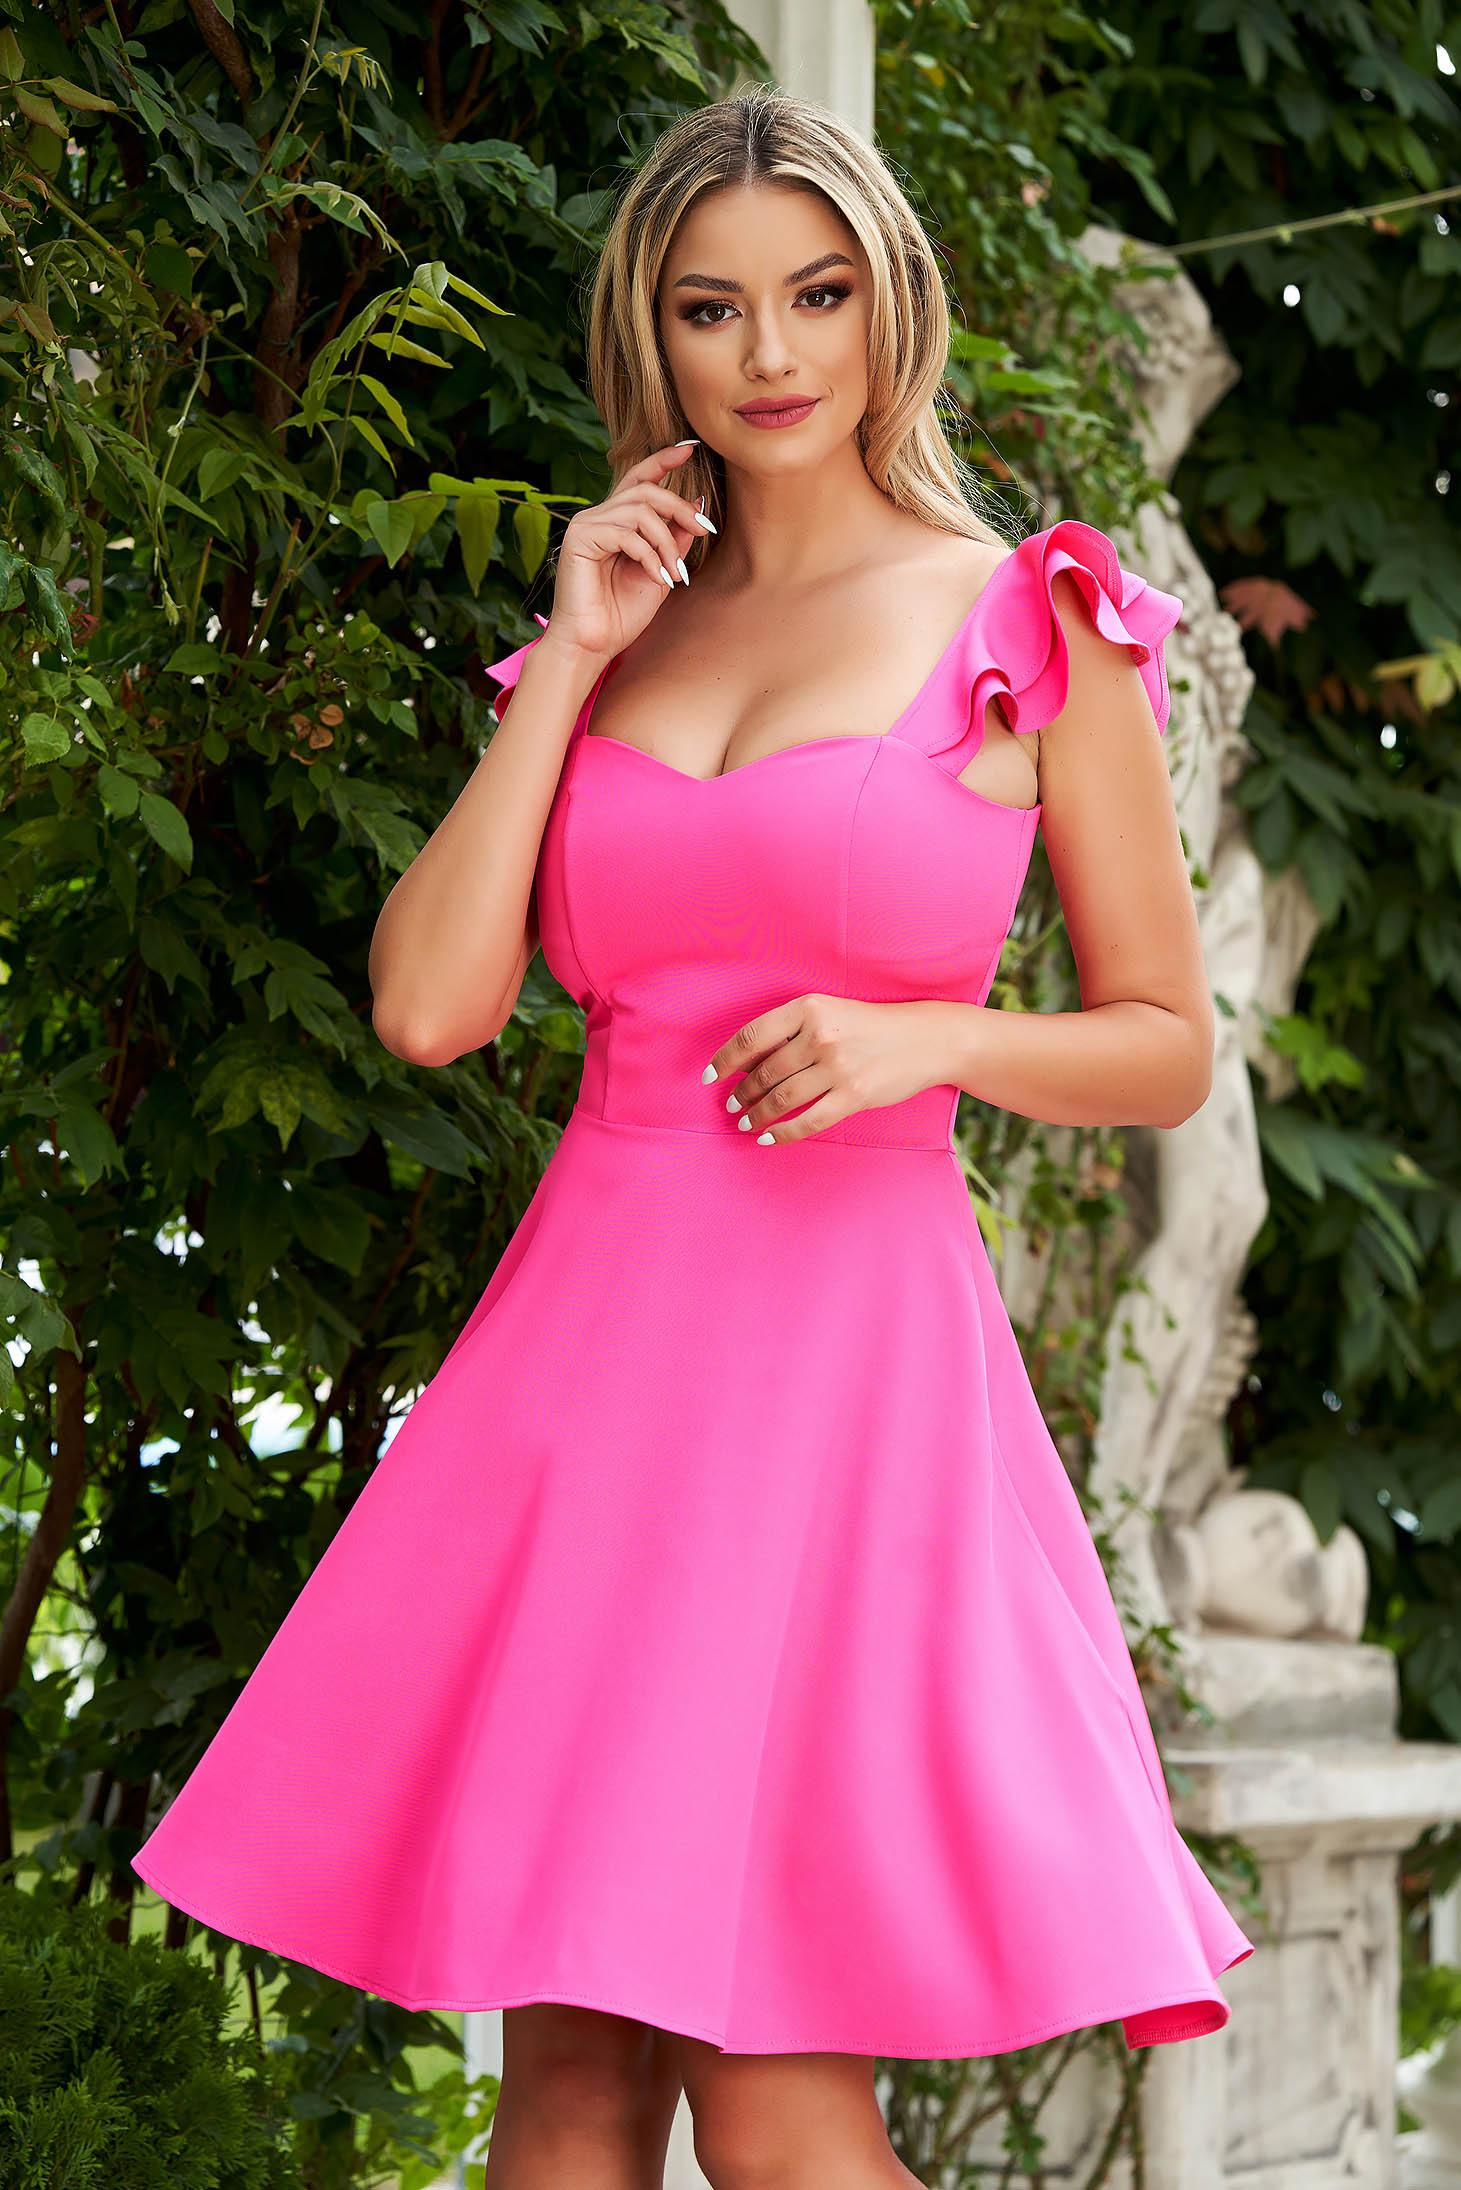 Dress StarShinerS pink elegant short cut cloth with ruffle details thin fabric